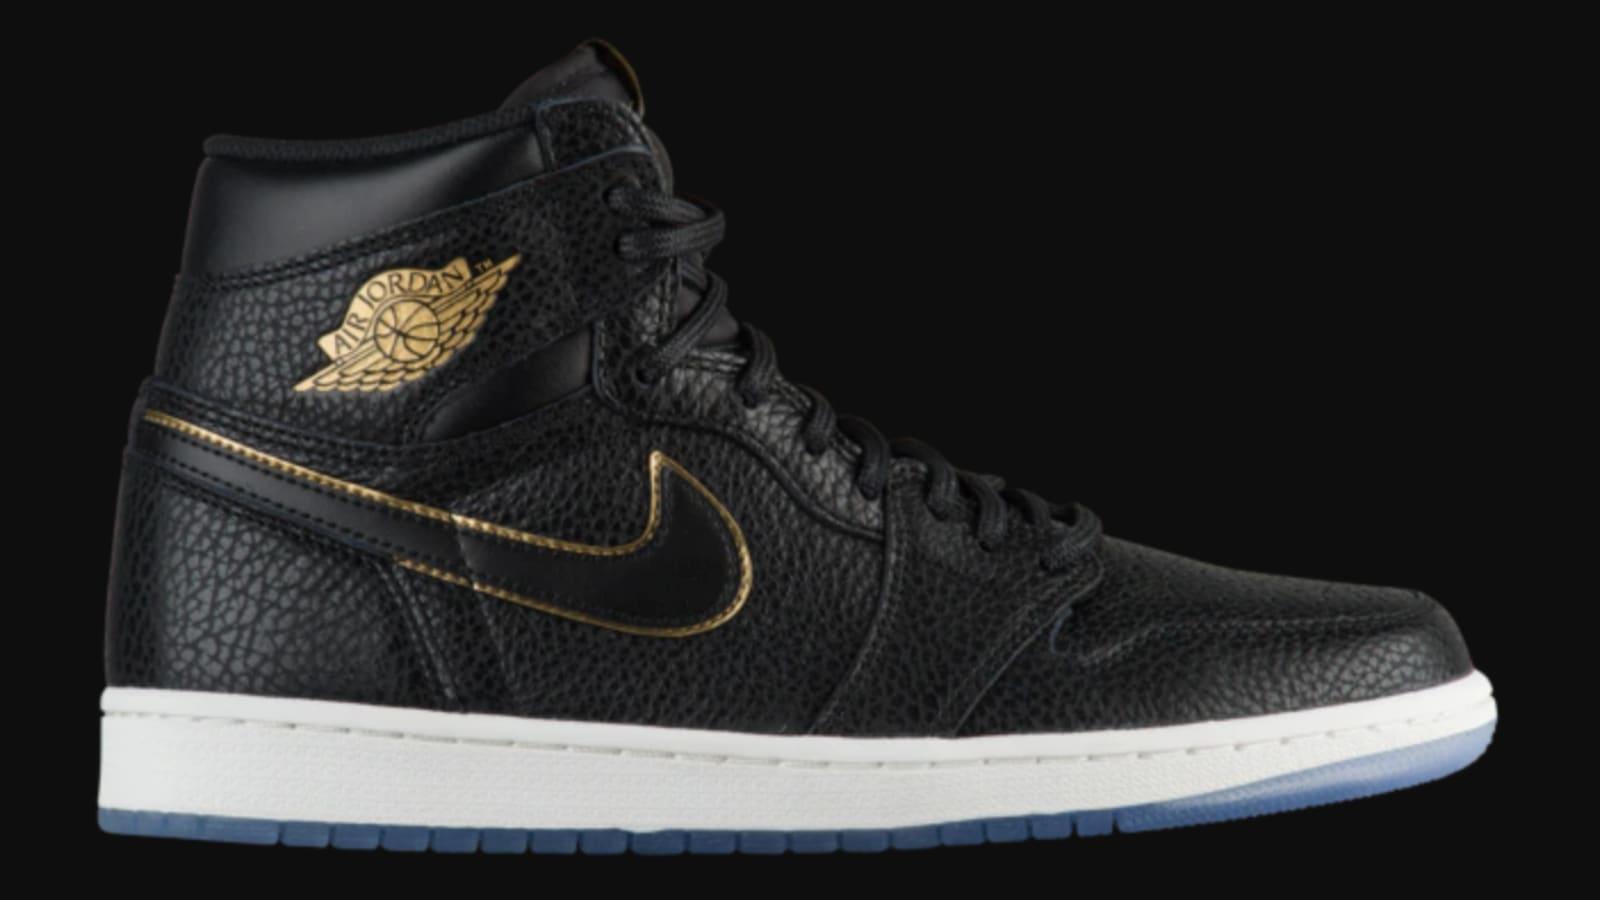 adidas Originals Glenbuck SPZL: On Foot Shots The Drop Date